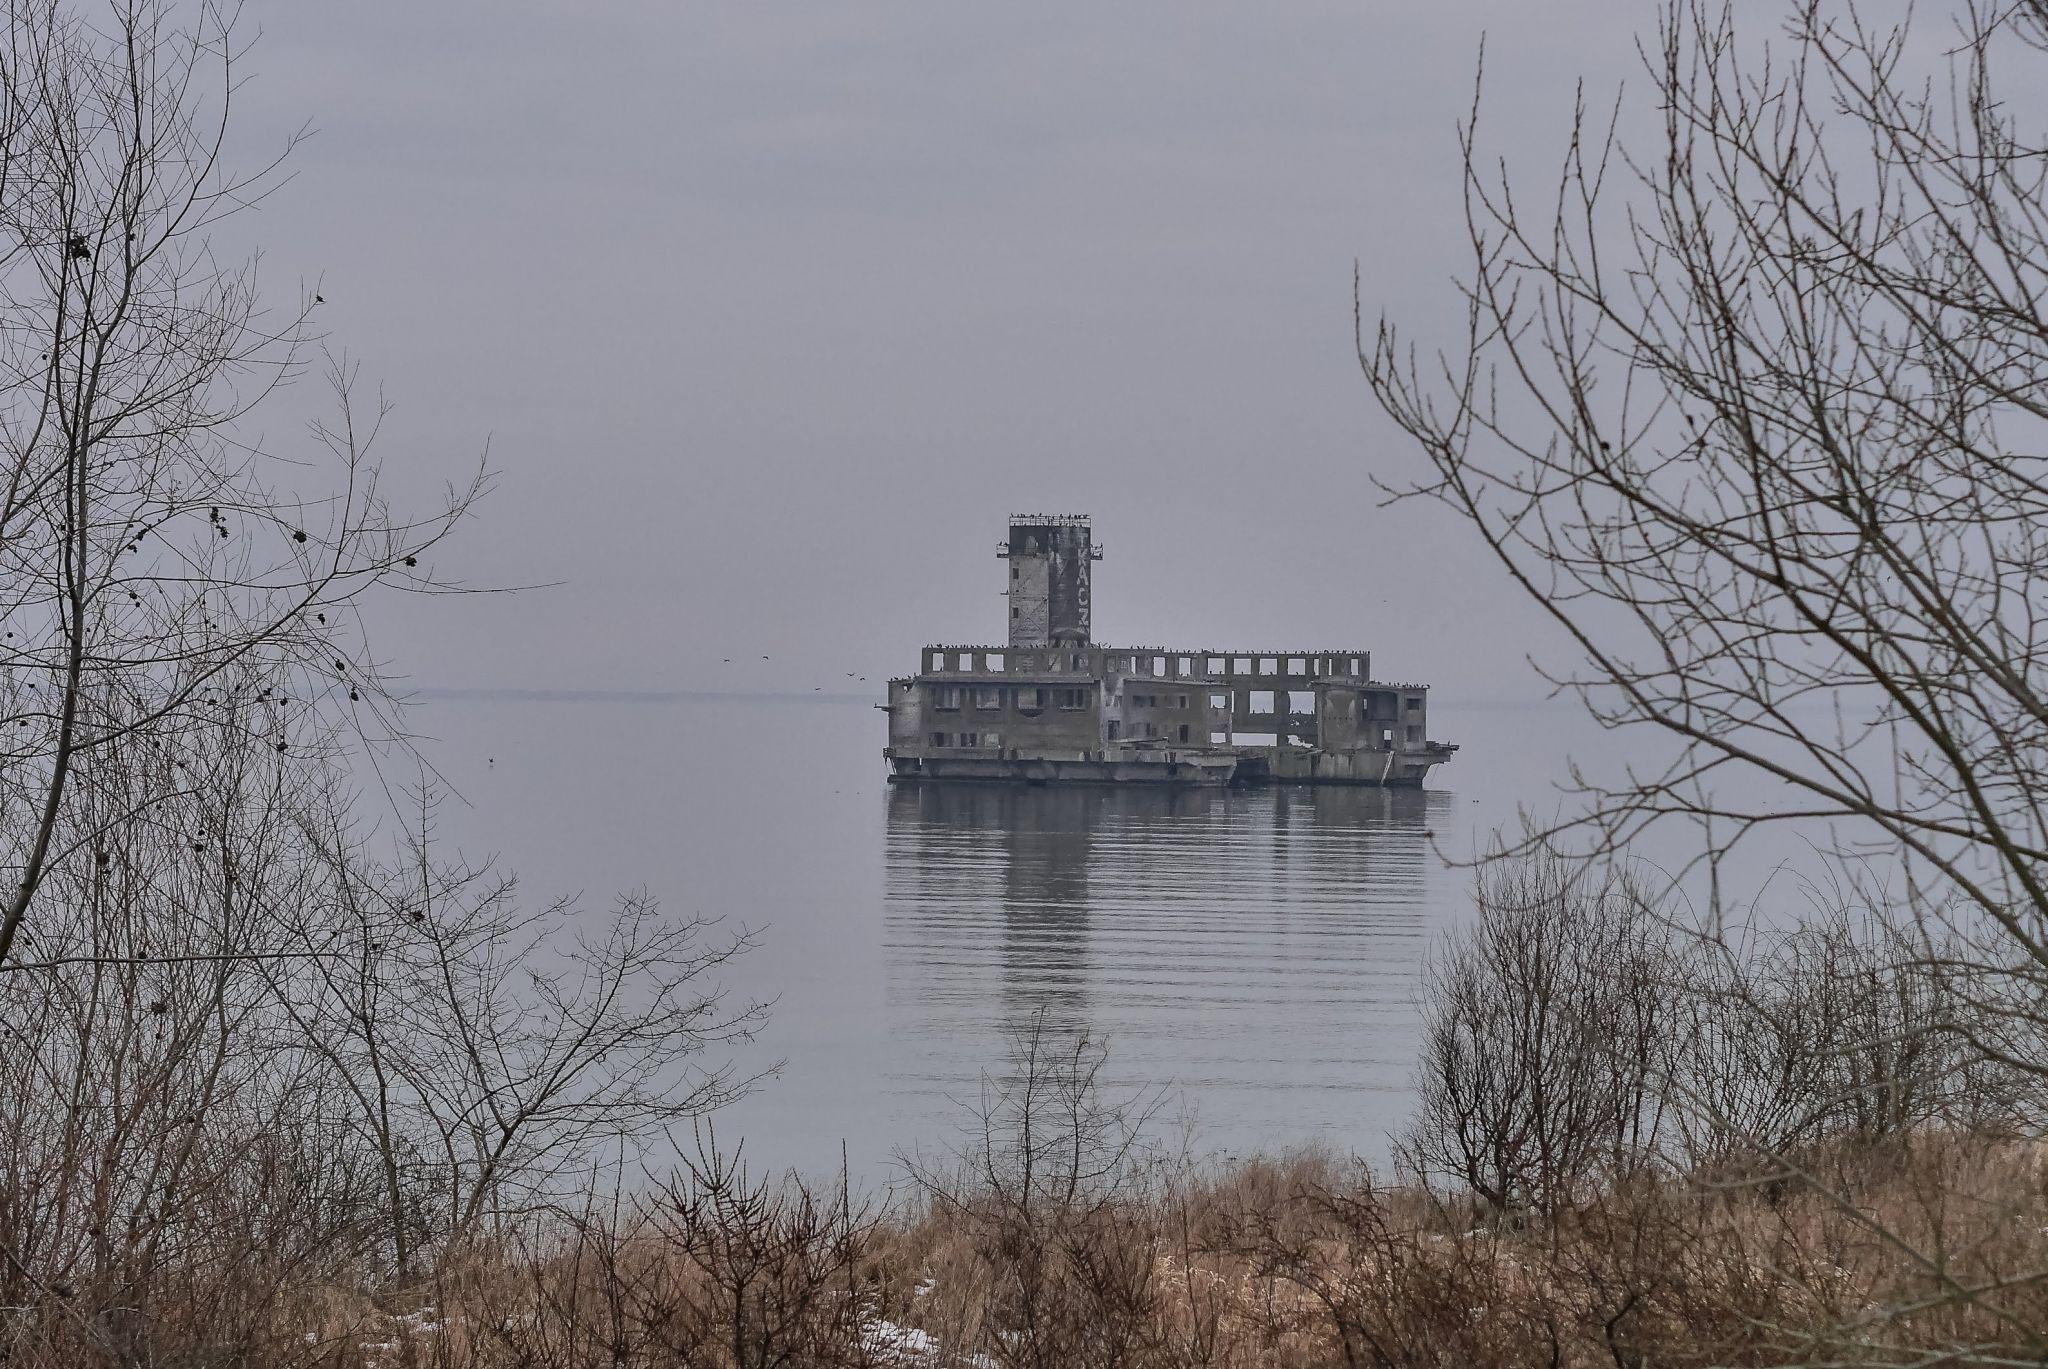 Torpedownia, Poland